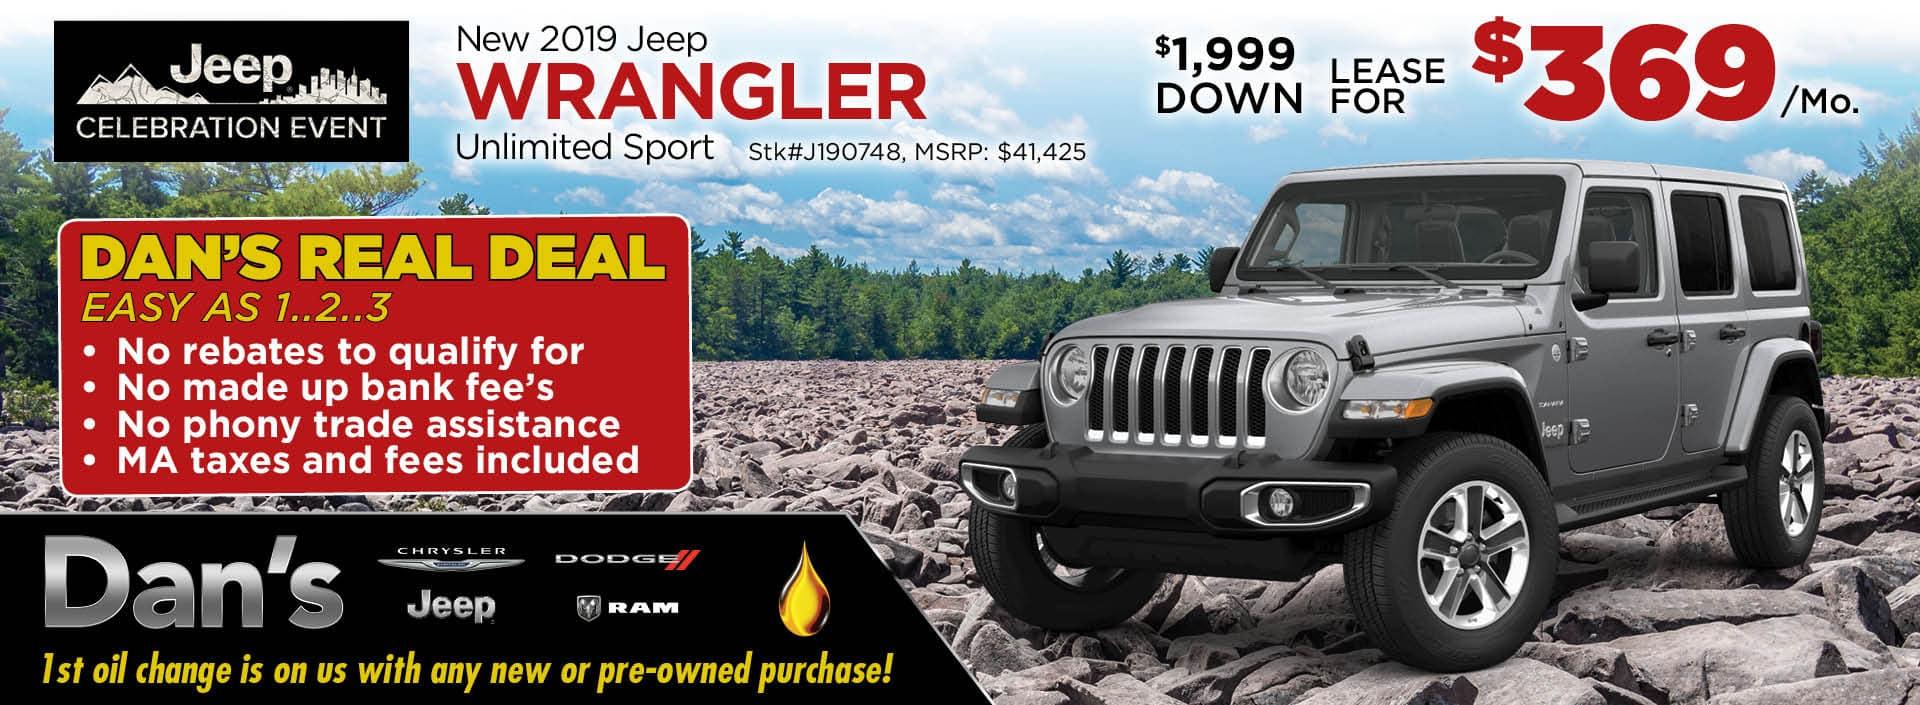 2019 Jeep Wrangler Unlimited Sport 4x4_1